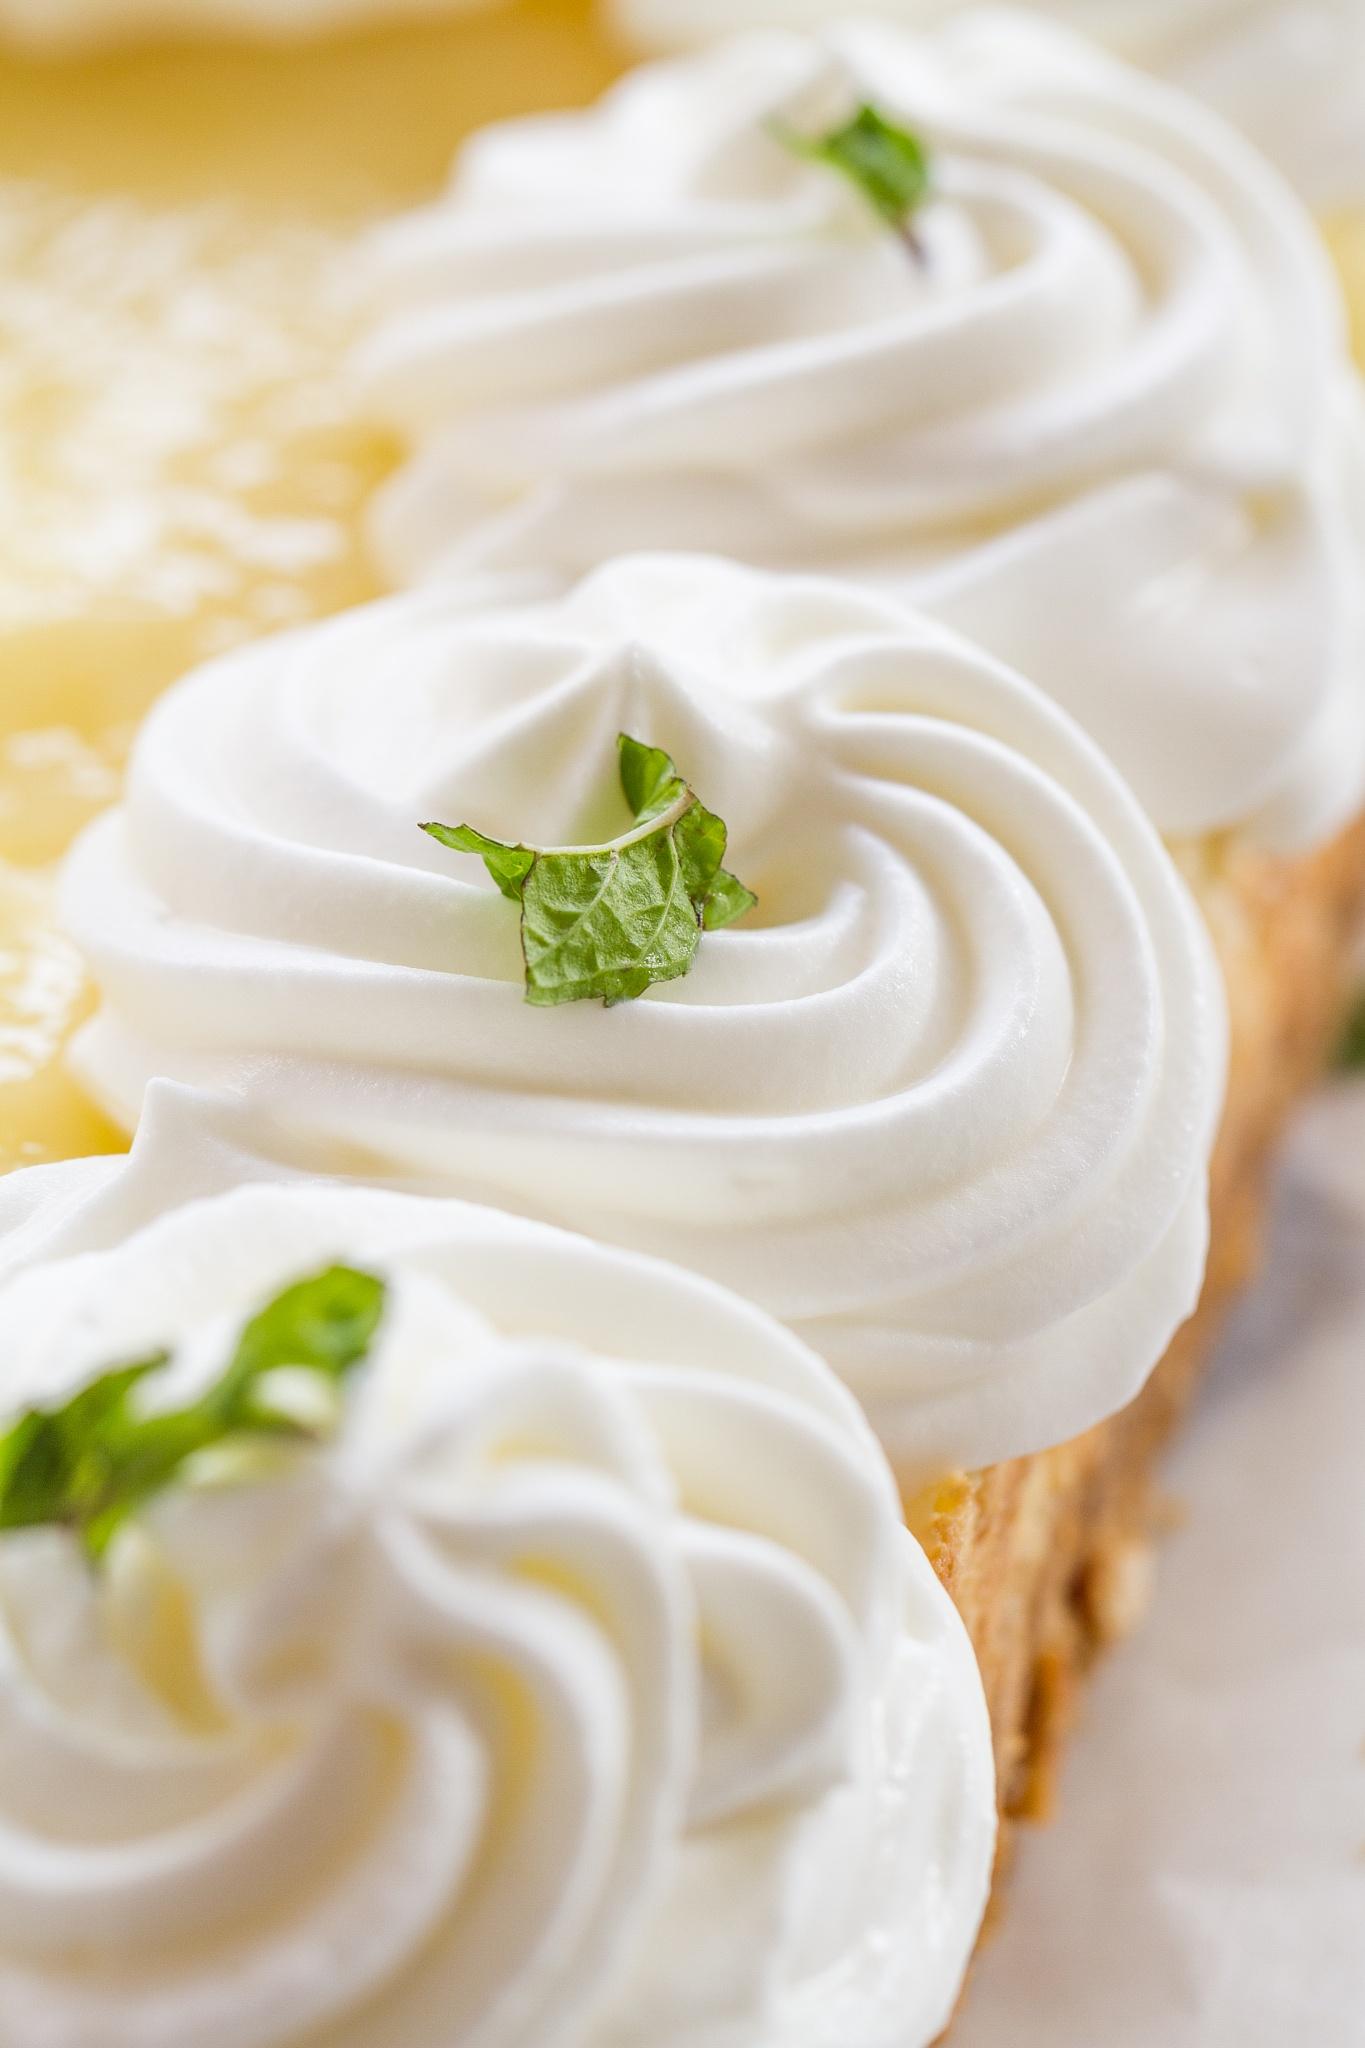 Cheesecake by Inbal Rubin